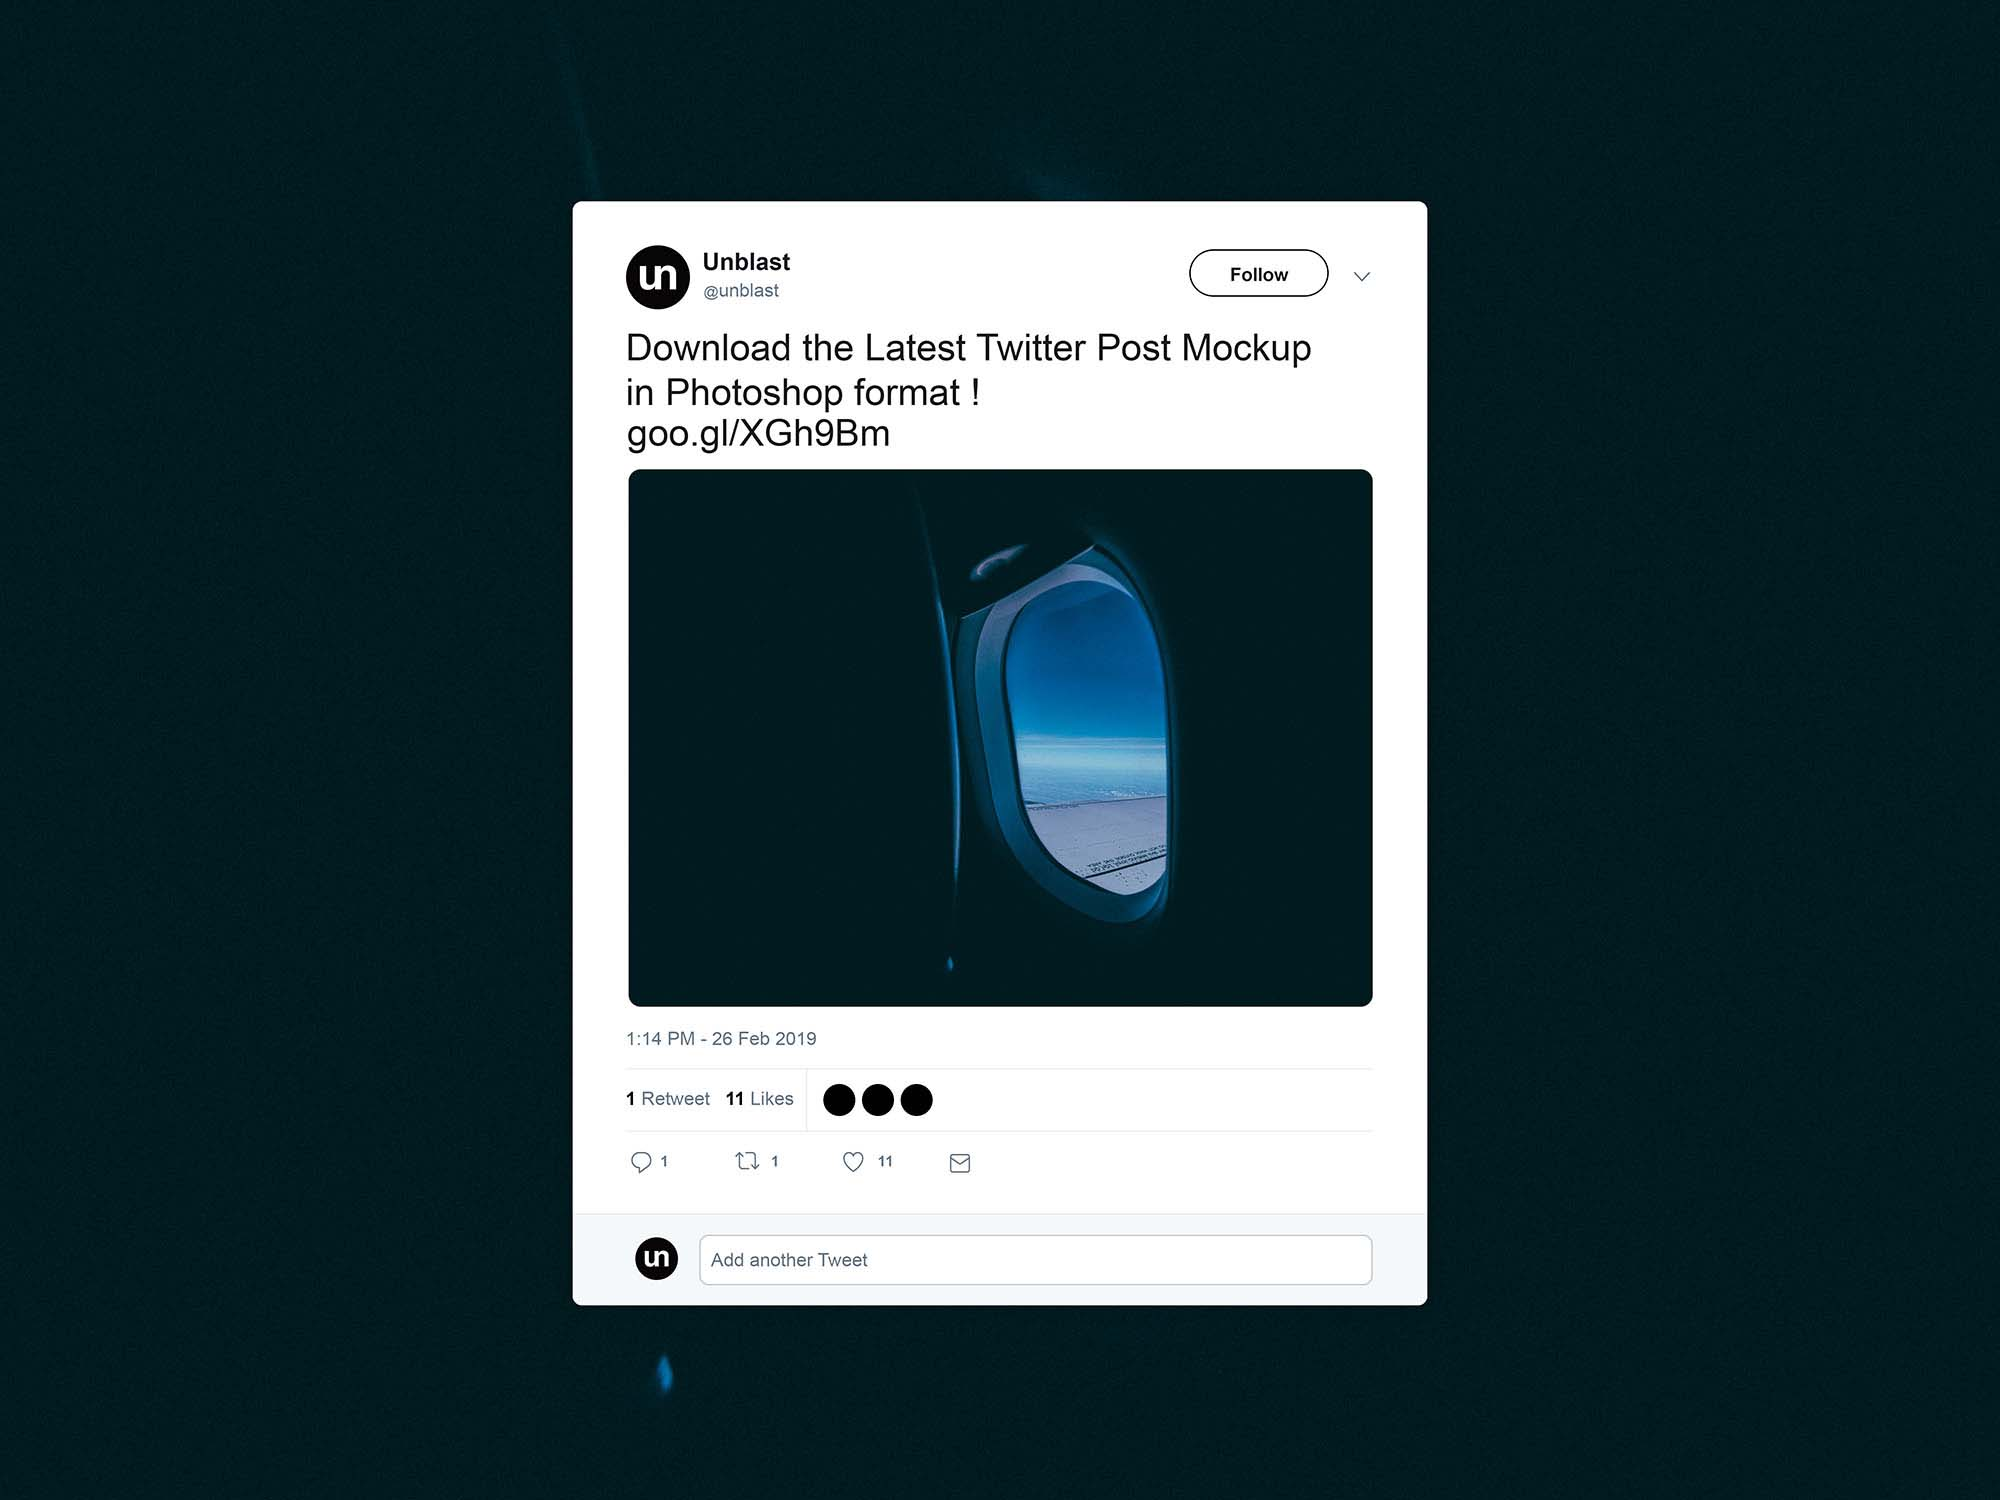 Twitter Post Mockup 1